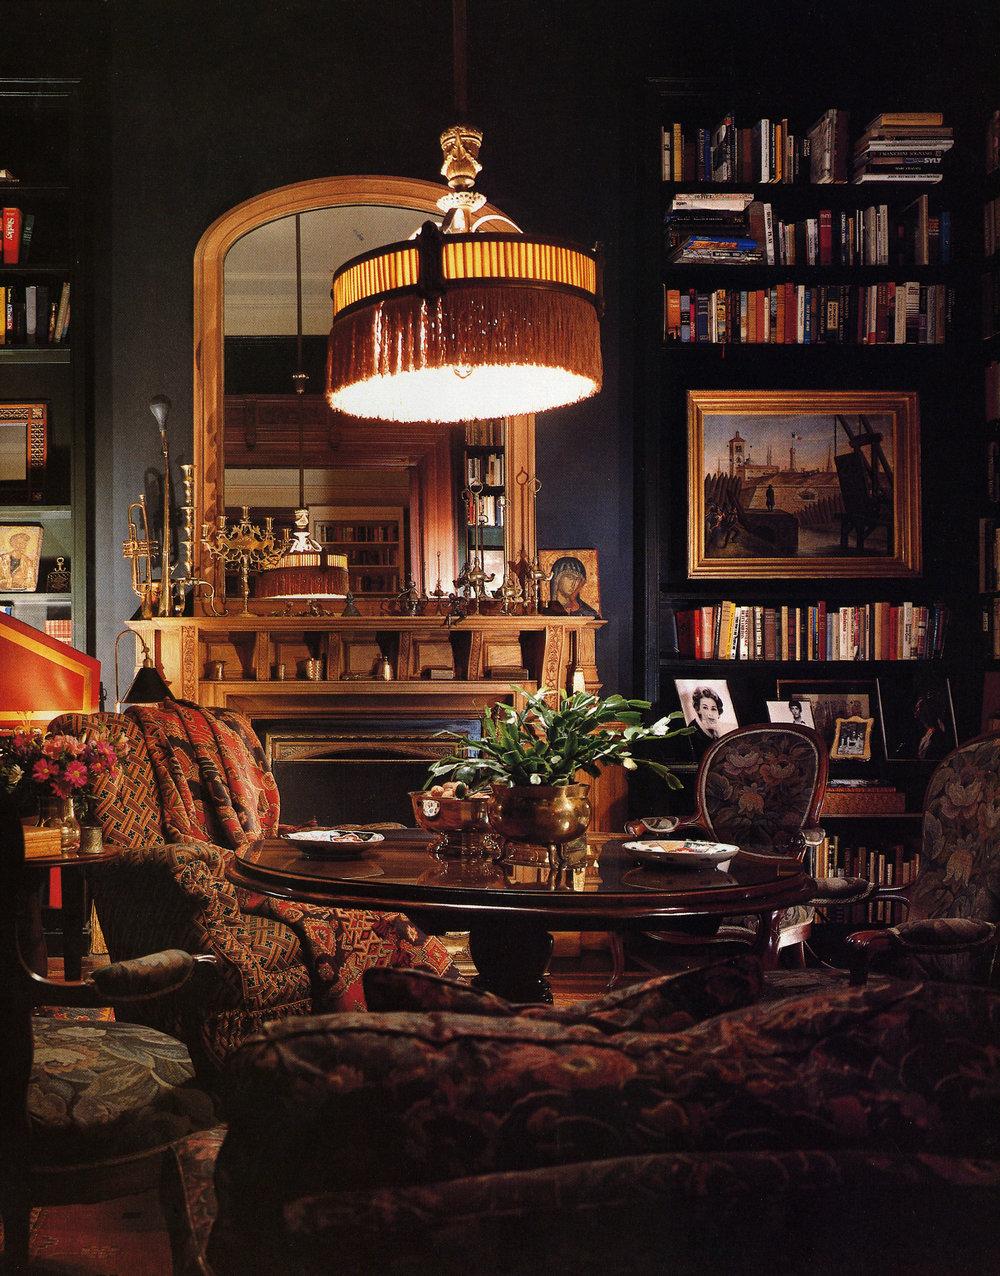 gail-jacobs-leonard-bernstein-apartment_25130626685_o.jpg